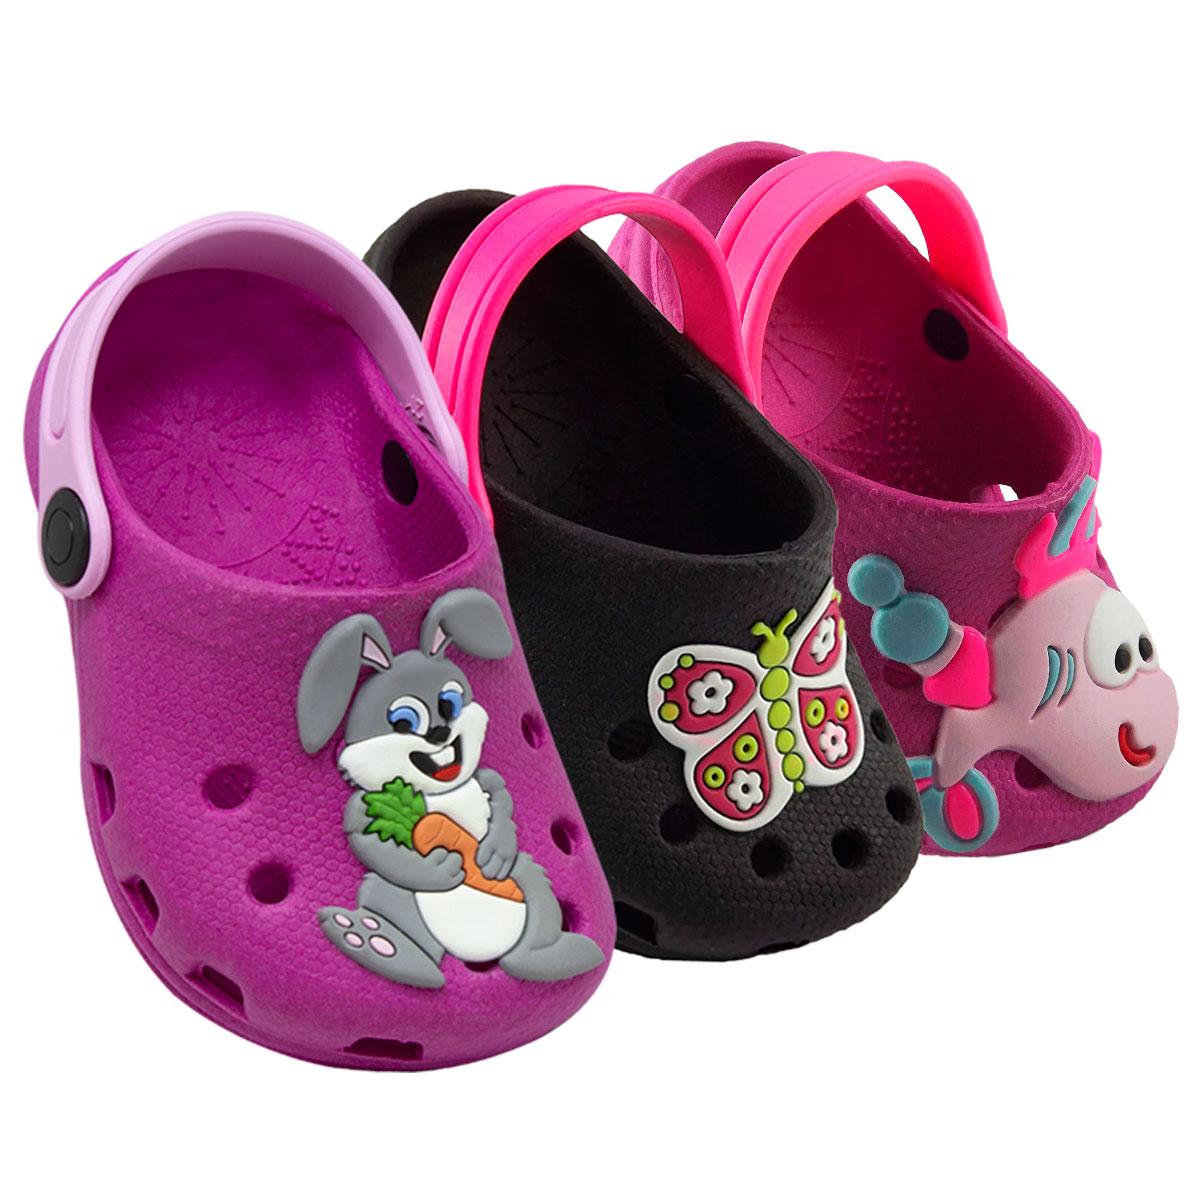 KIT 03 pares de Babuche Infantil Feminino ( Borboleta + Coelhinho + Peixe pink )